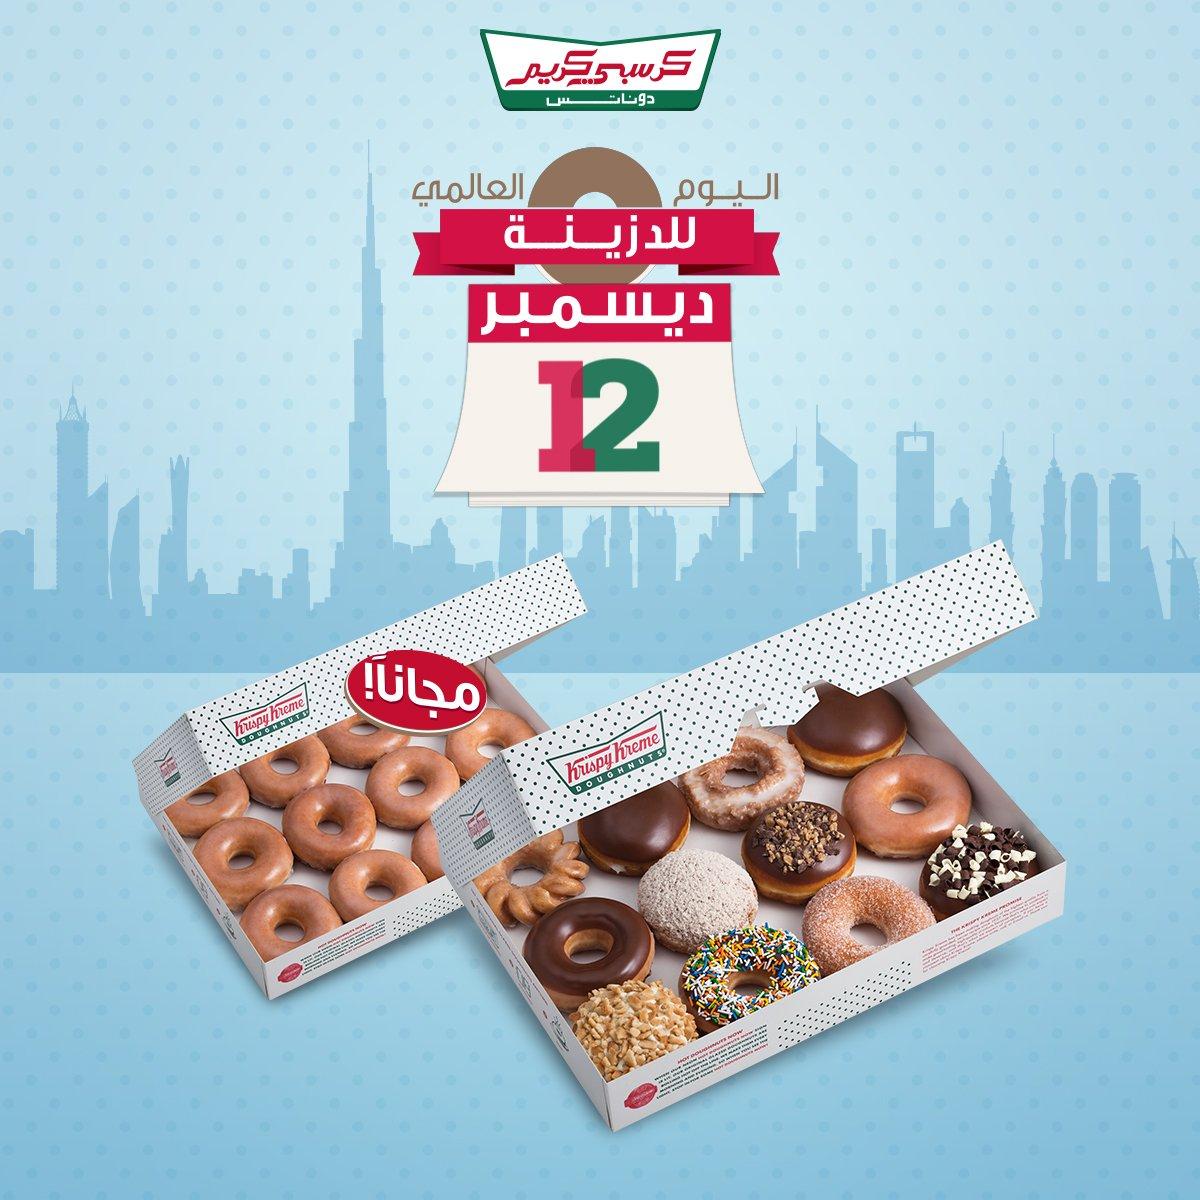 Krispy Kreme Me On Twitter لا تفوتوا عرض السنة عرض الـ 12 12